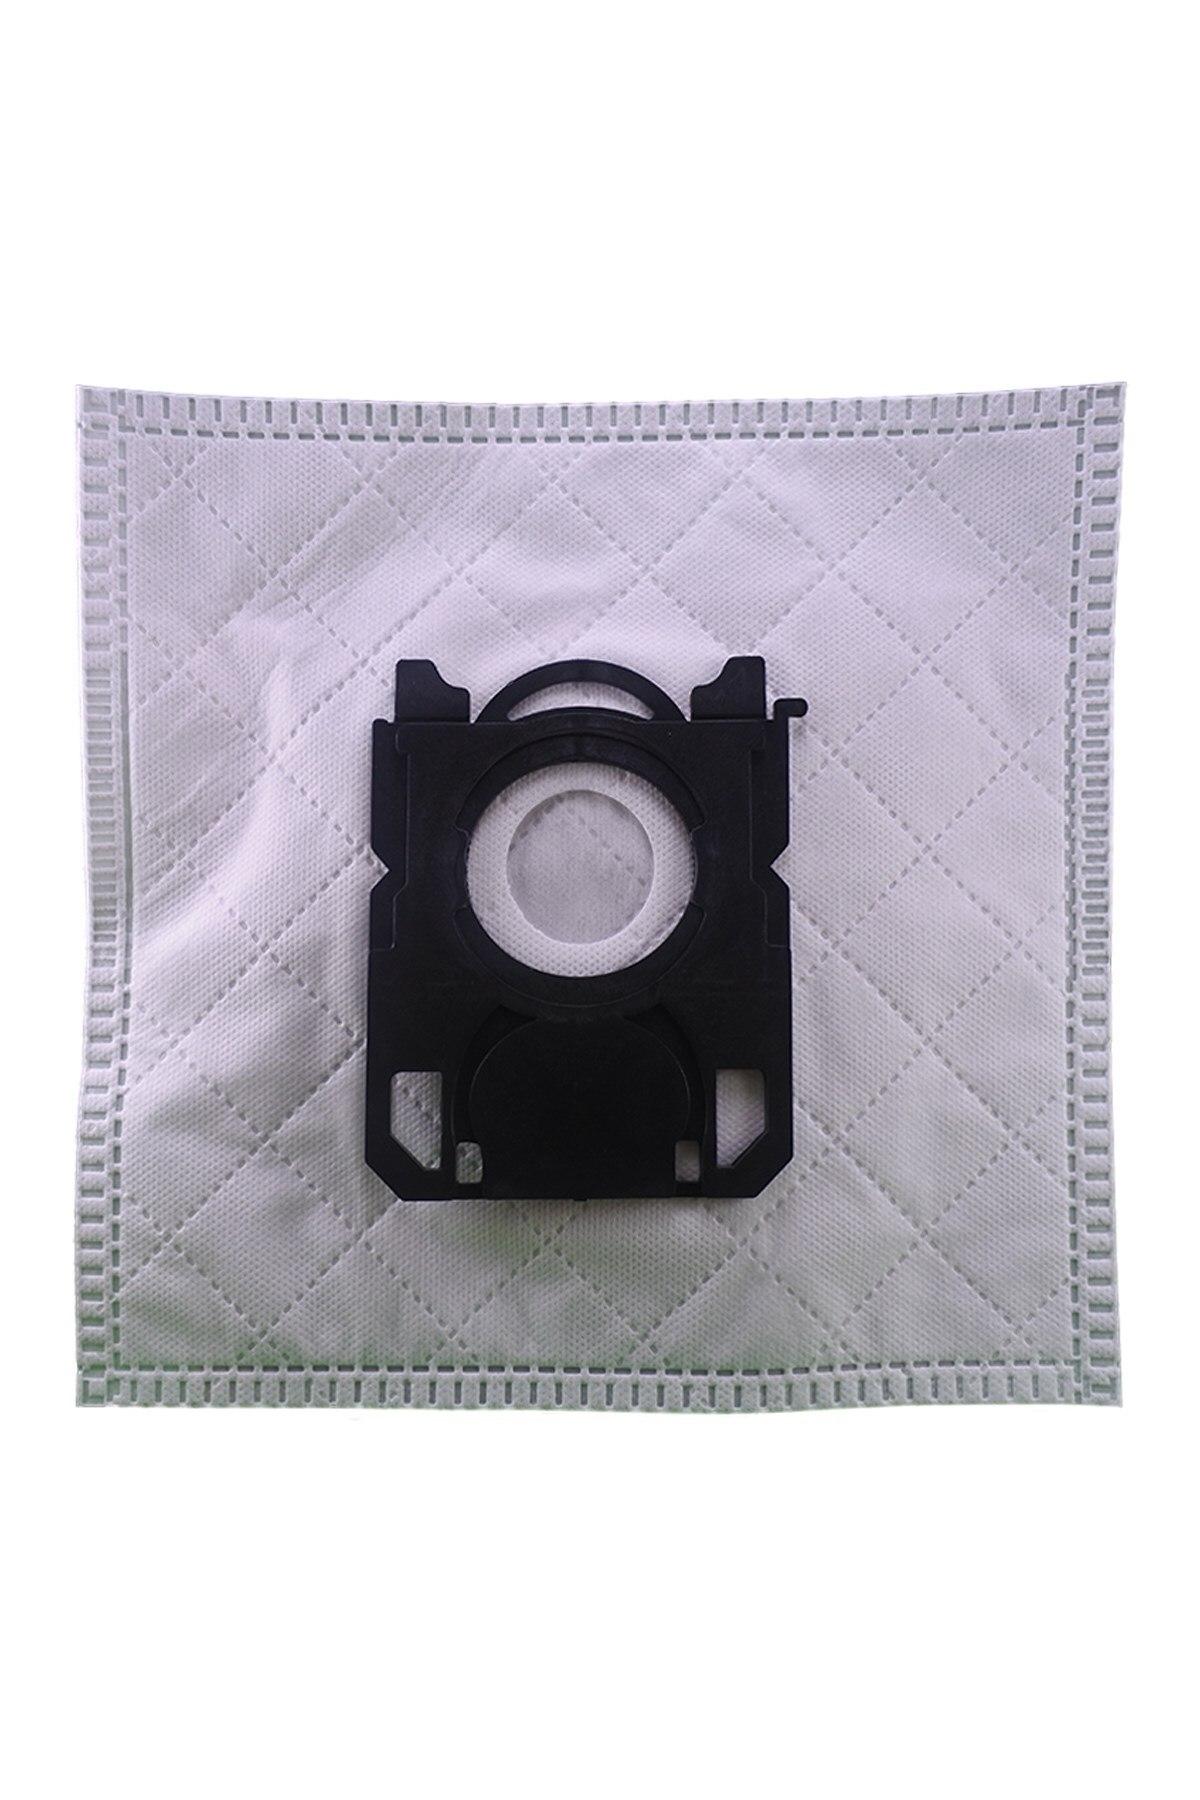 5 uds bolsa de polvo AEG AO-Serie-Oxígeno + vacío limpiador de polvo bolsa de 5 uds